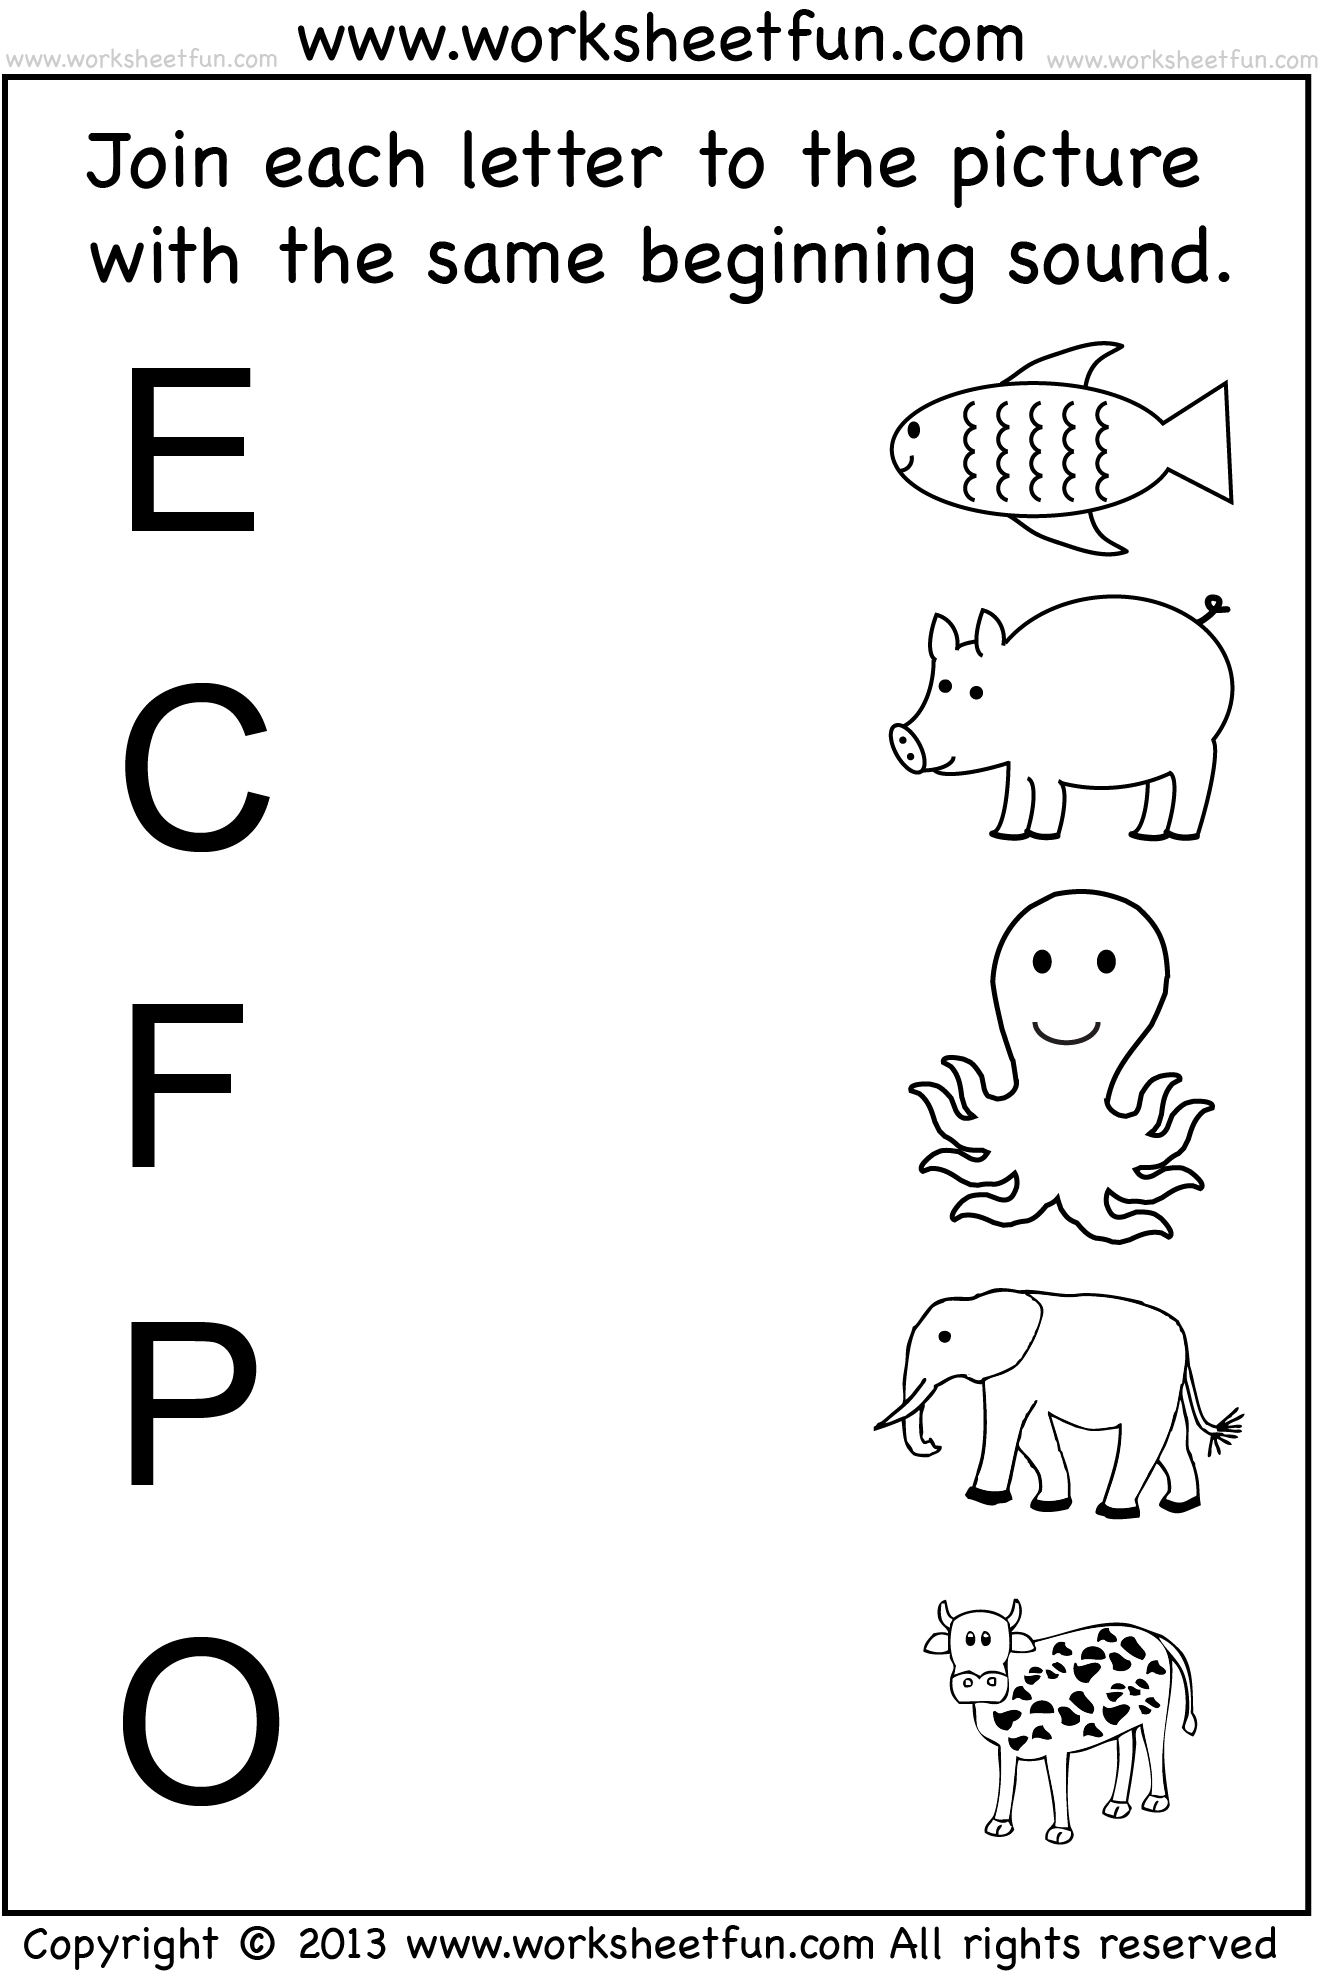 Beginning Sound - 7 Worksheets | Preschool Worksheets ...